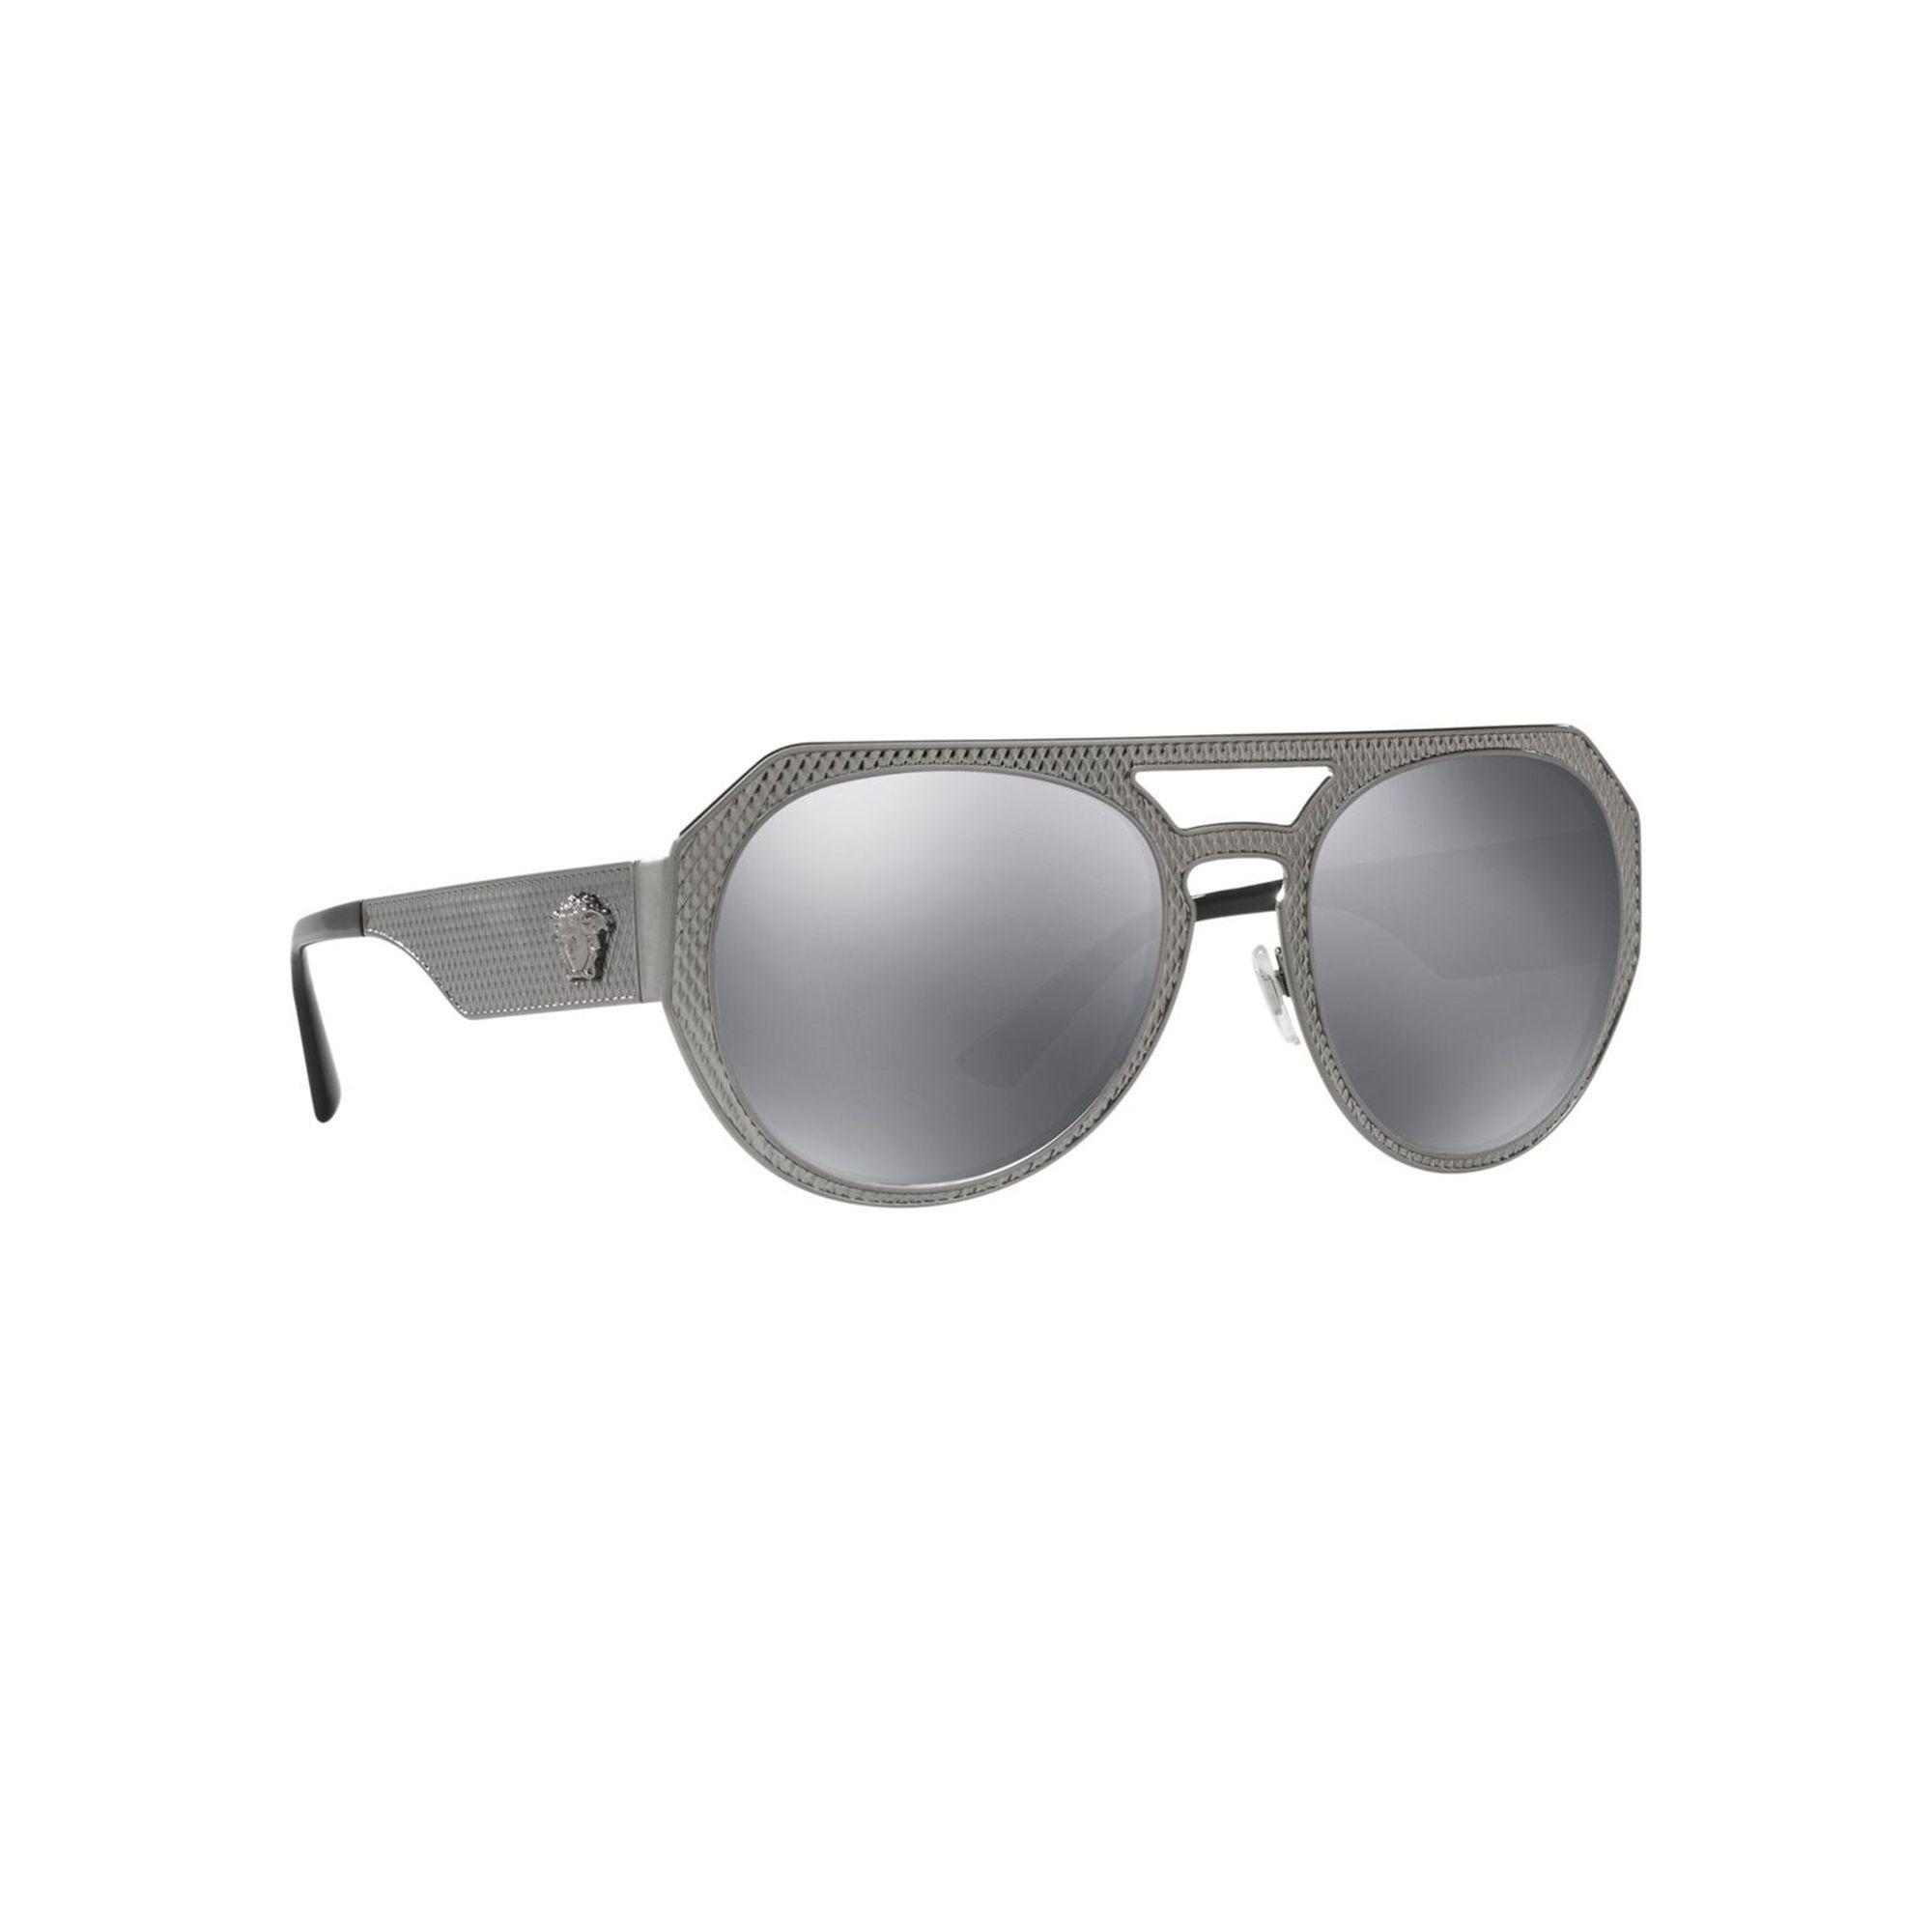 8438a2ac5cdd Versace Gunmetal Ve2175 Round Sunglasses in Gray - Lyst